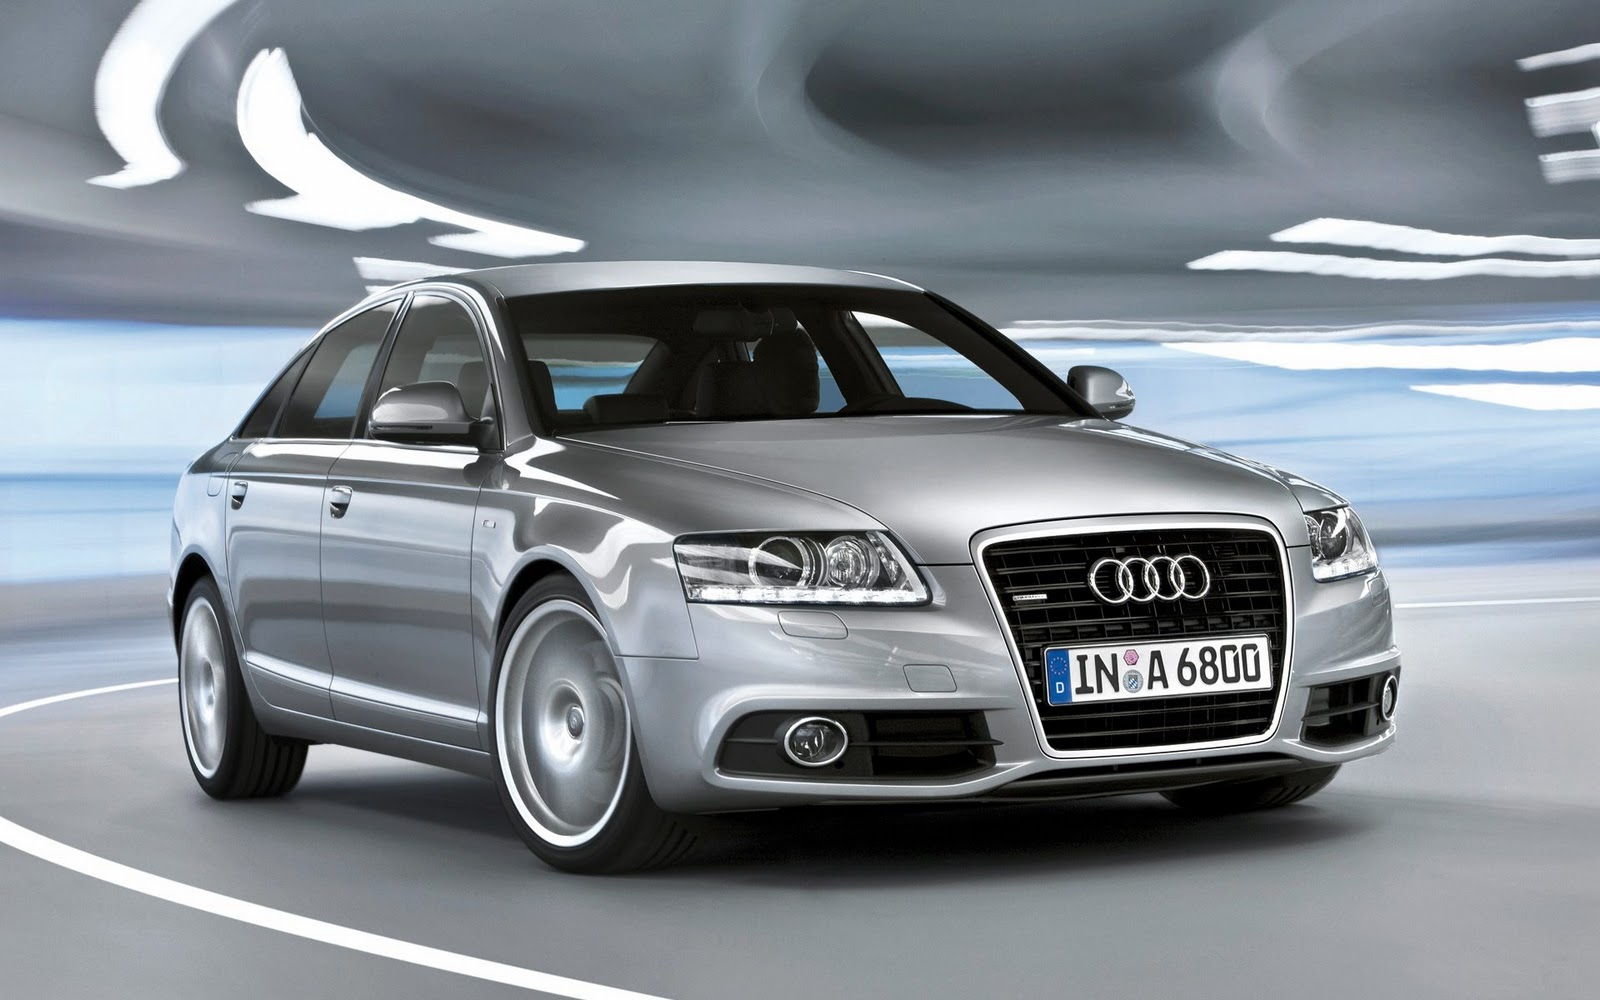 Download HD Car Wallpaper Background 6616 HD Wallpaper 3D 1600x1000